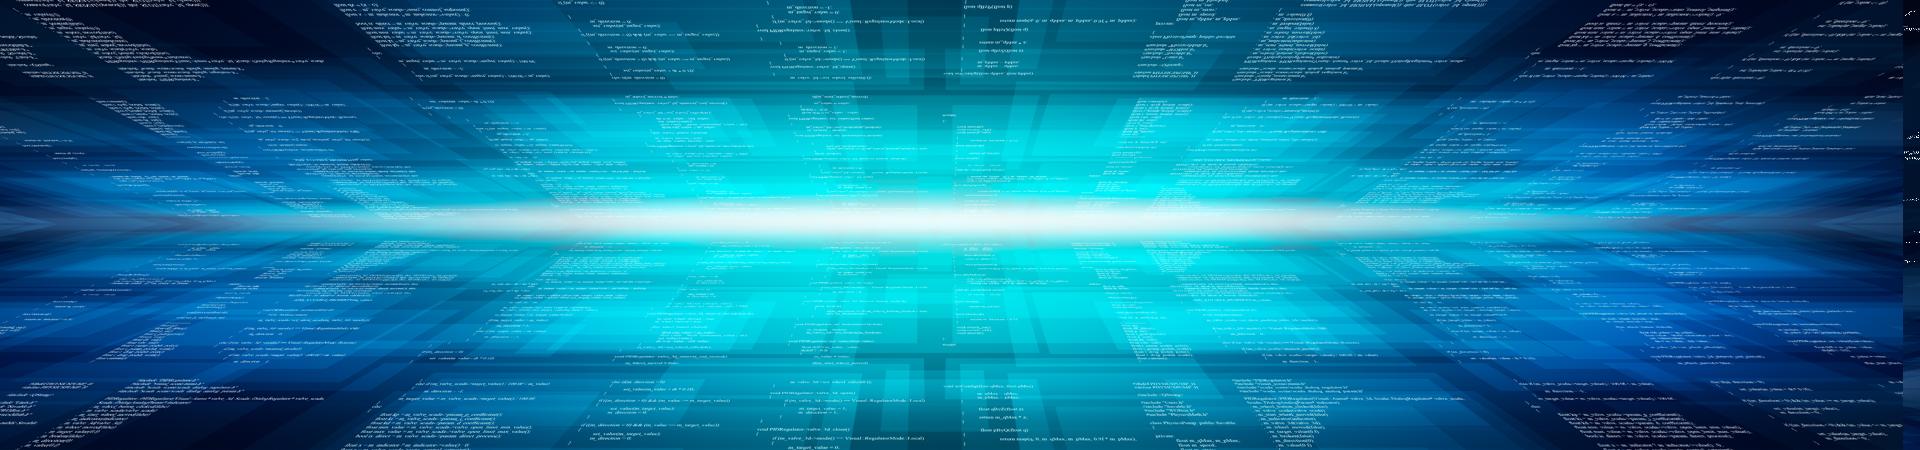 Banner Datenbank 1920x450px | SEGNO